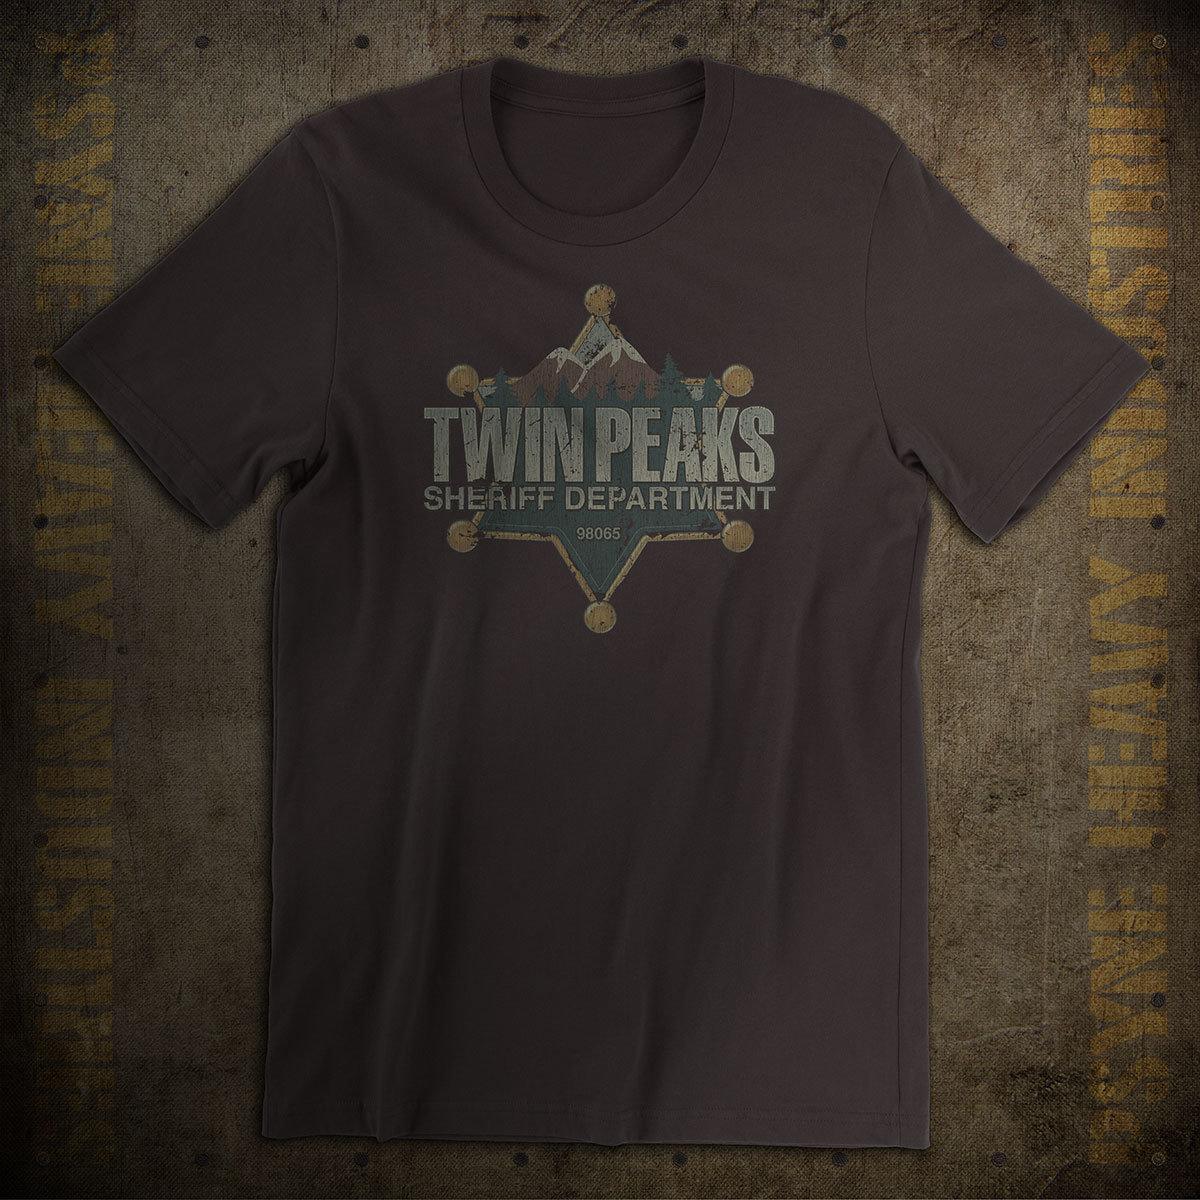 Twin Peaks Sheriff Department Vintage T-Shirt